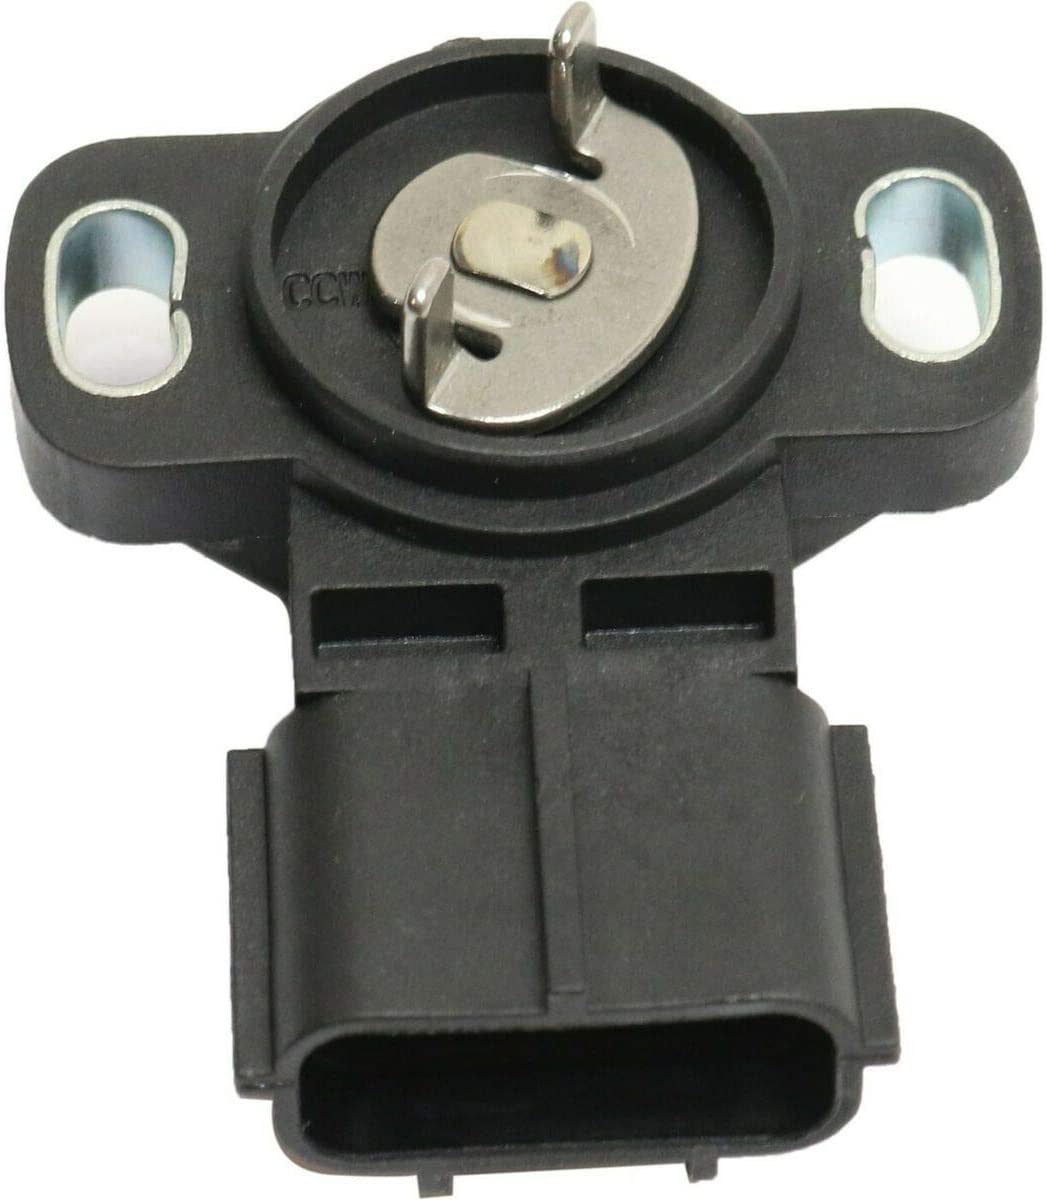 Throttle half Position Sensor Ranking TOP3 Compatible with Kia 4 Sorento 2003-2006